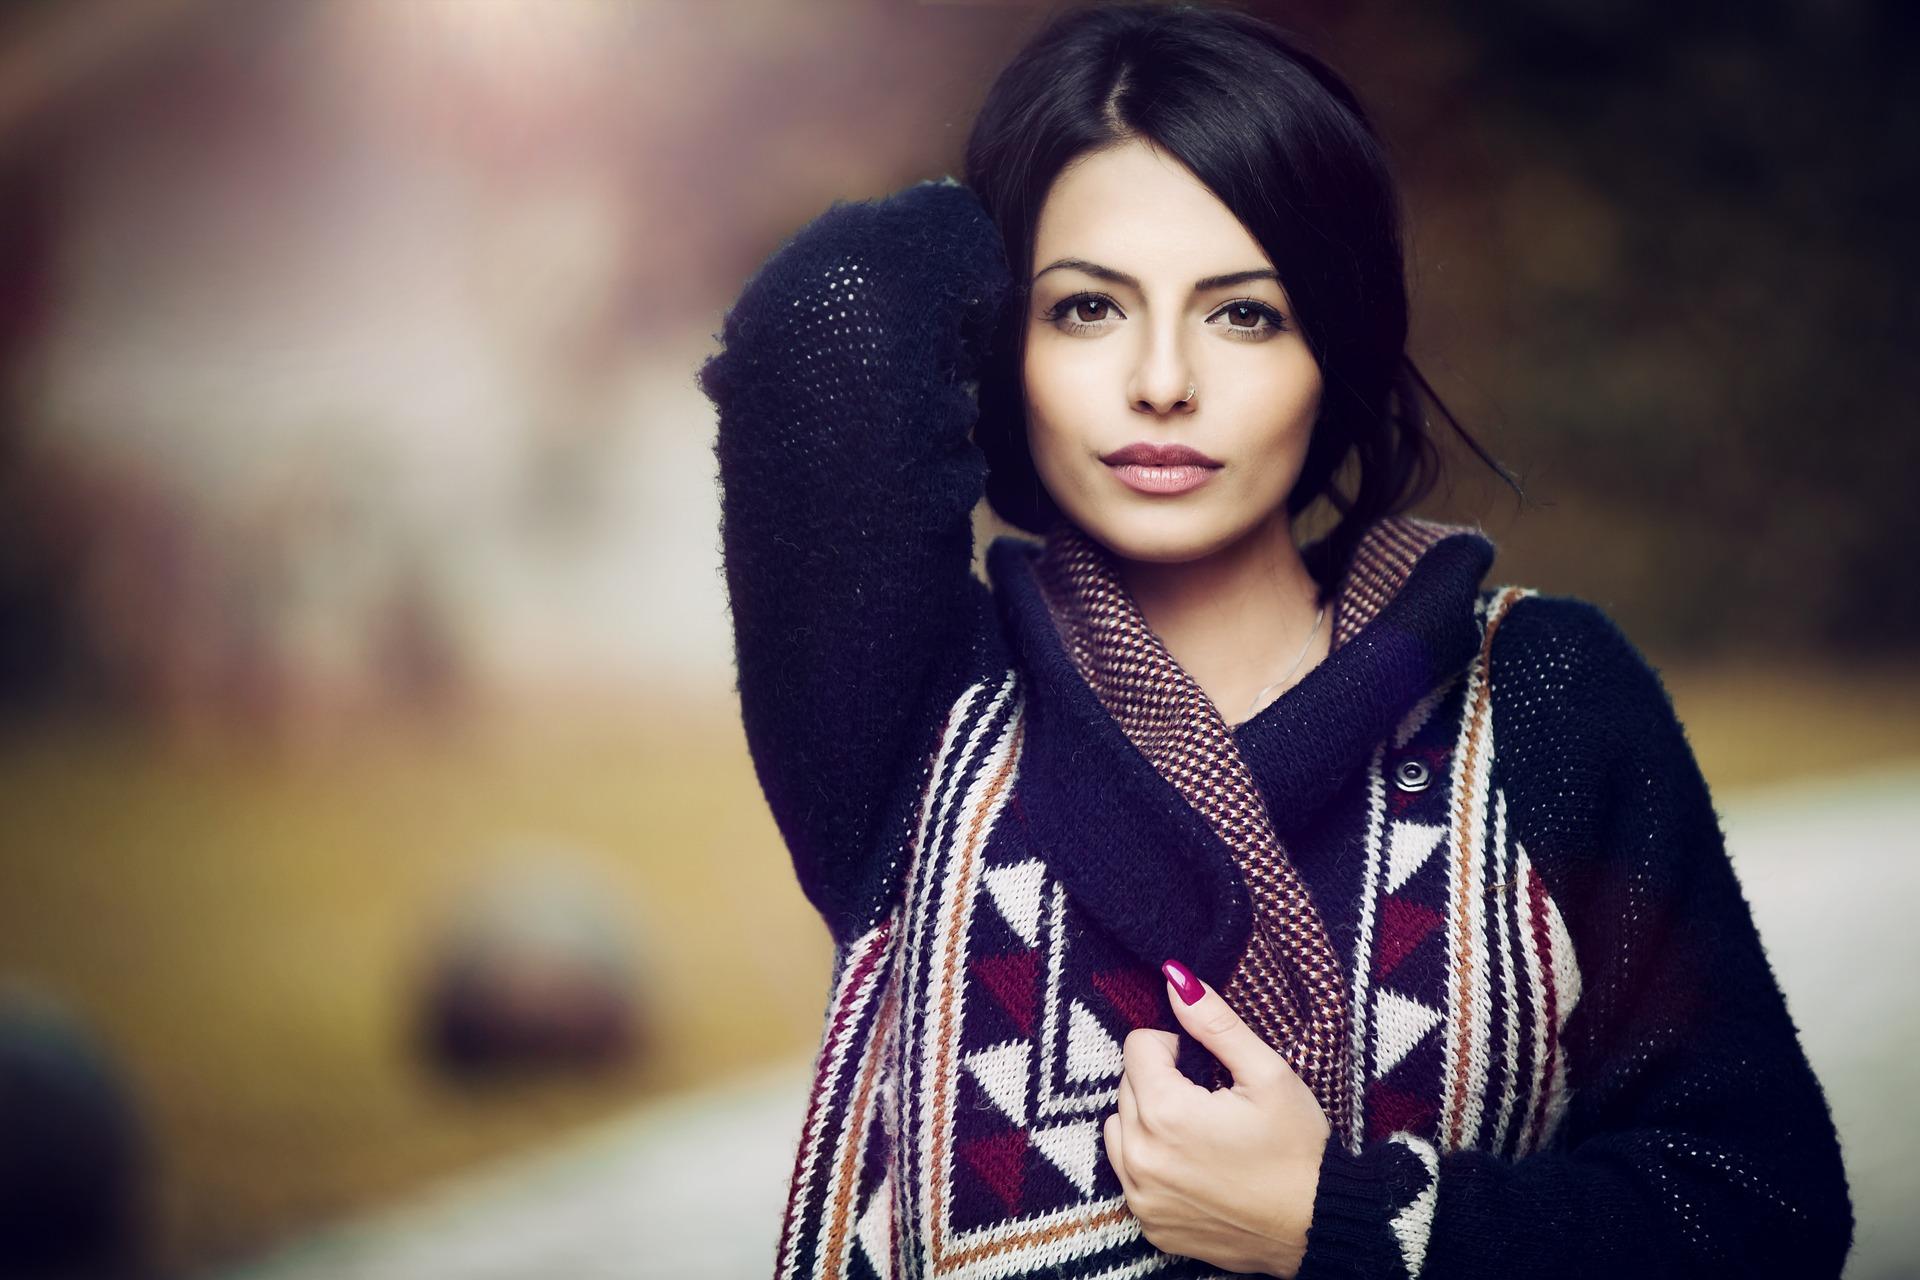 Veronika Skálová